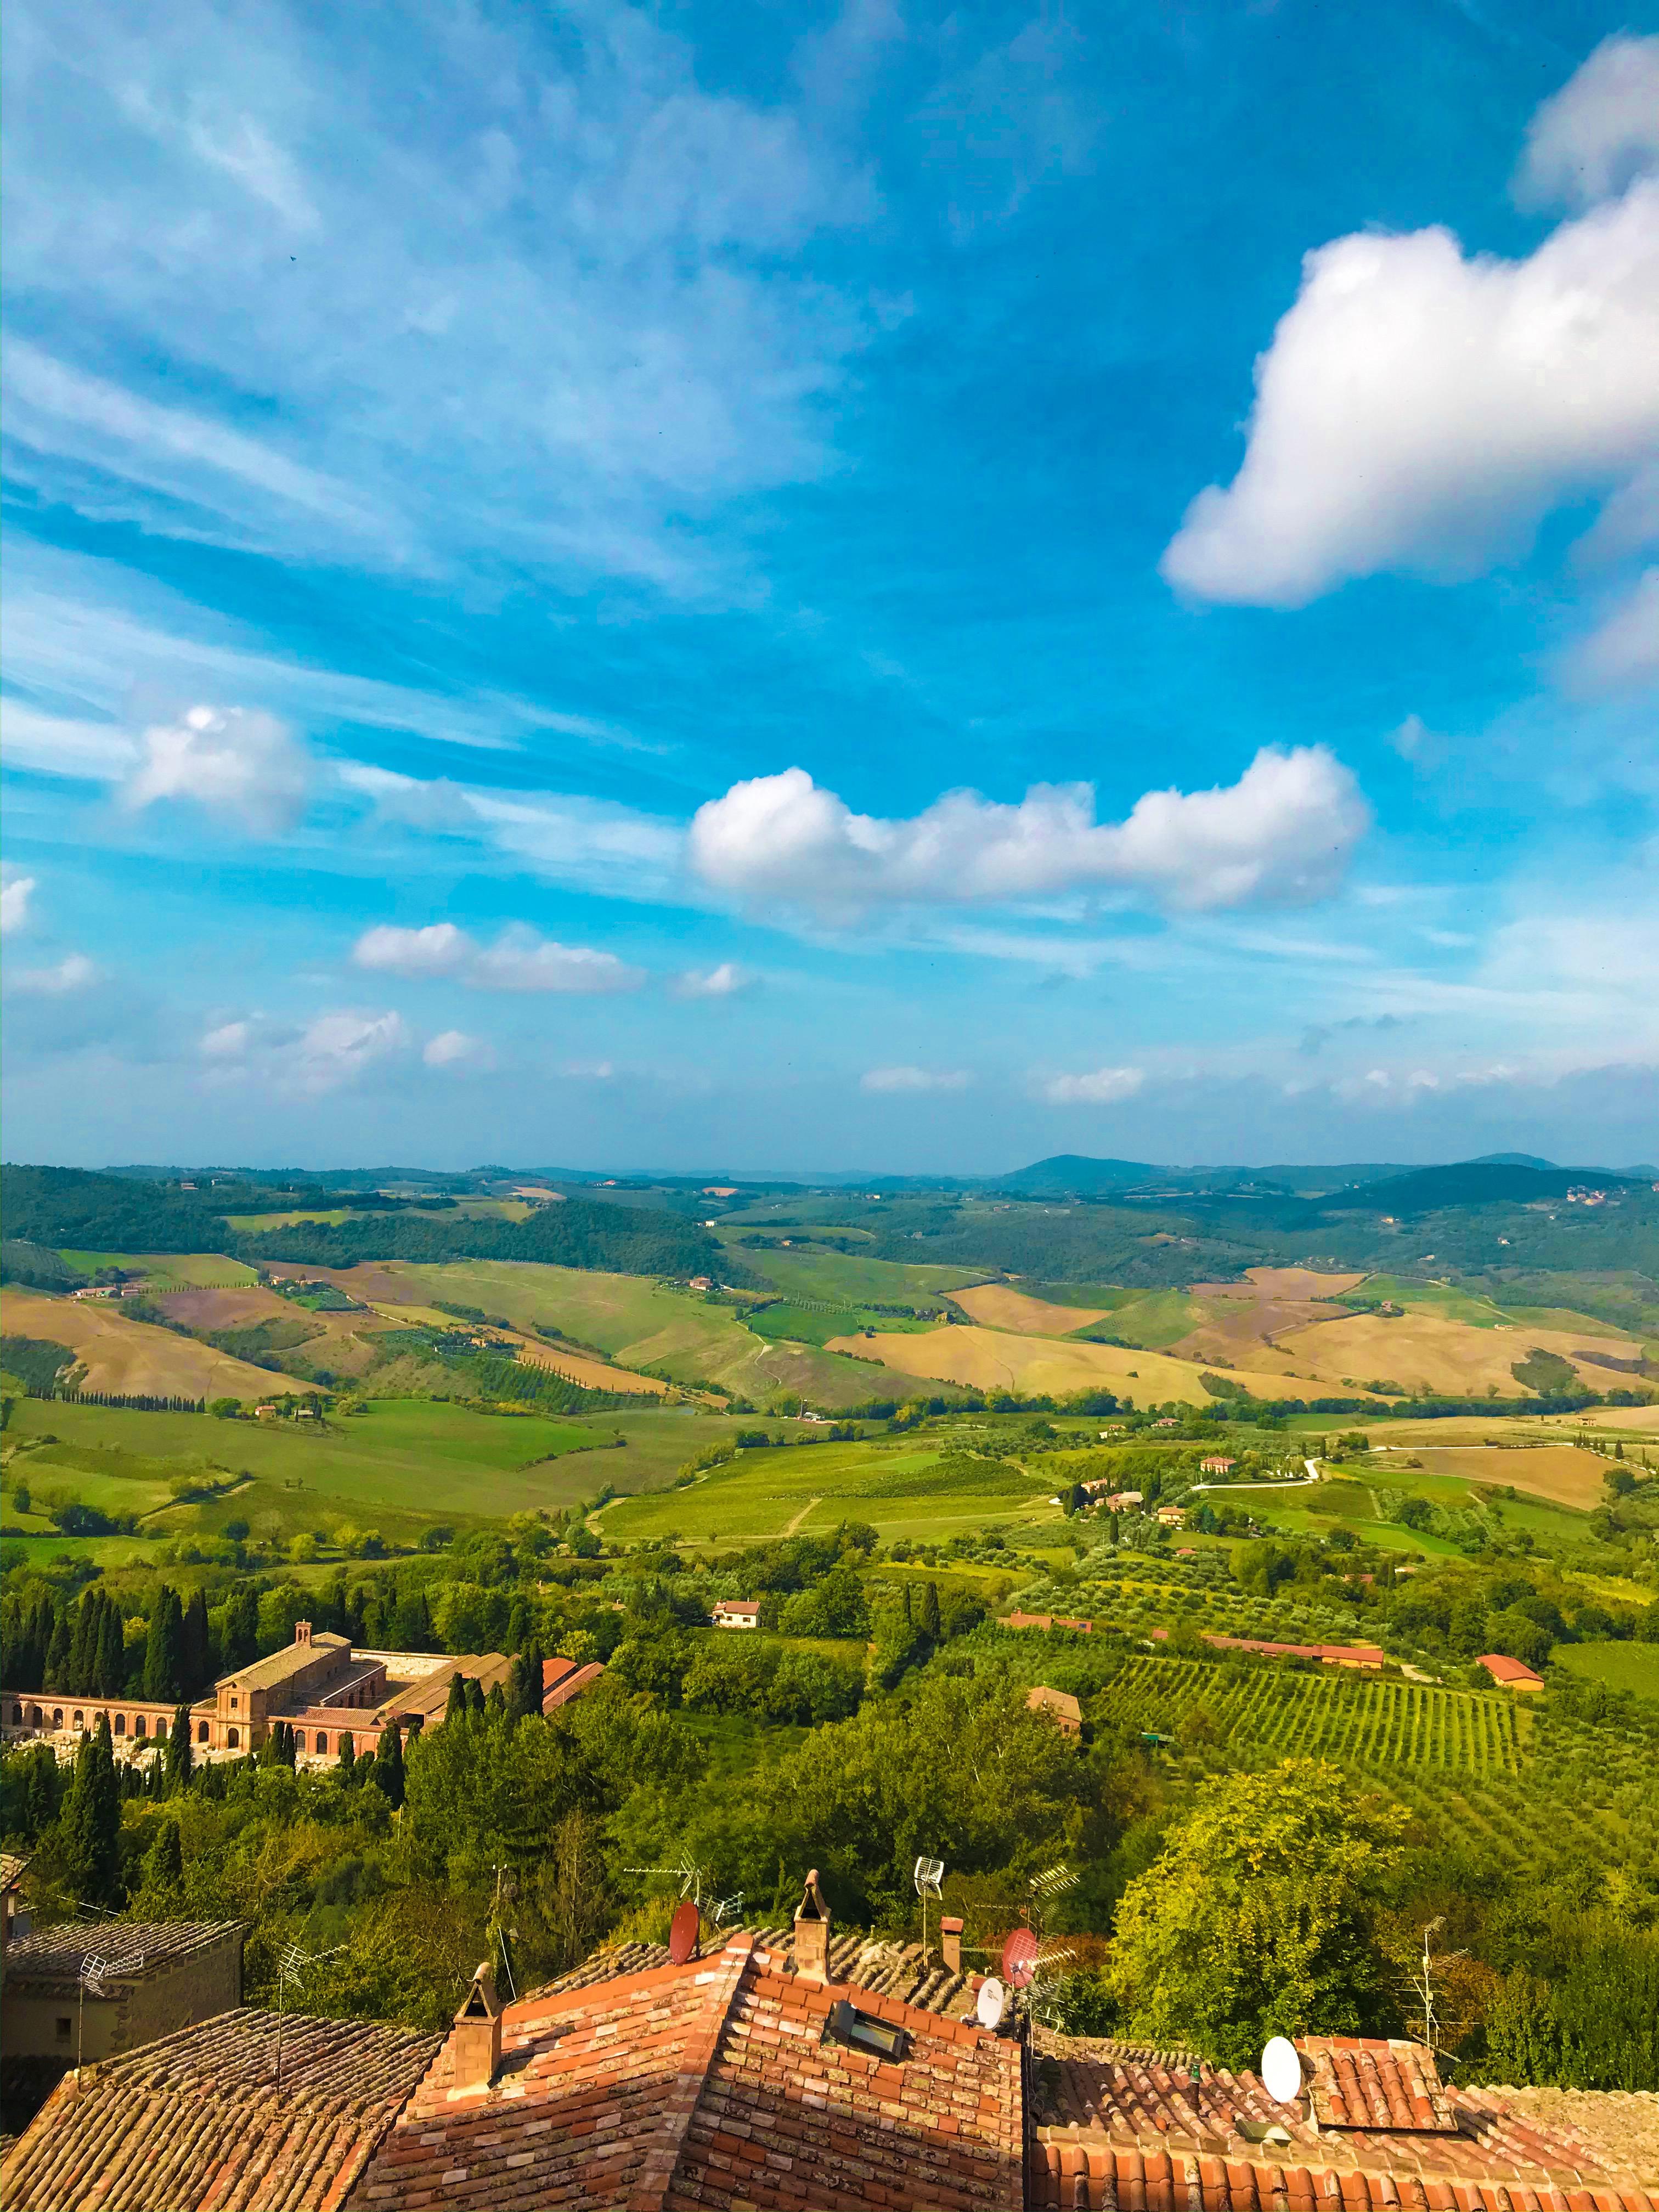 Overlook, tuscany, montepulciano